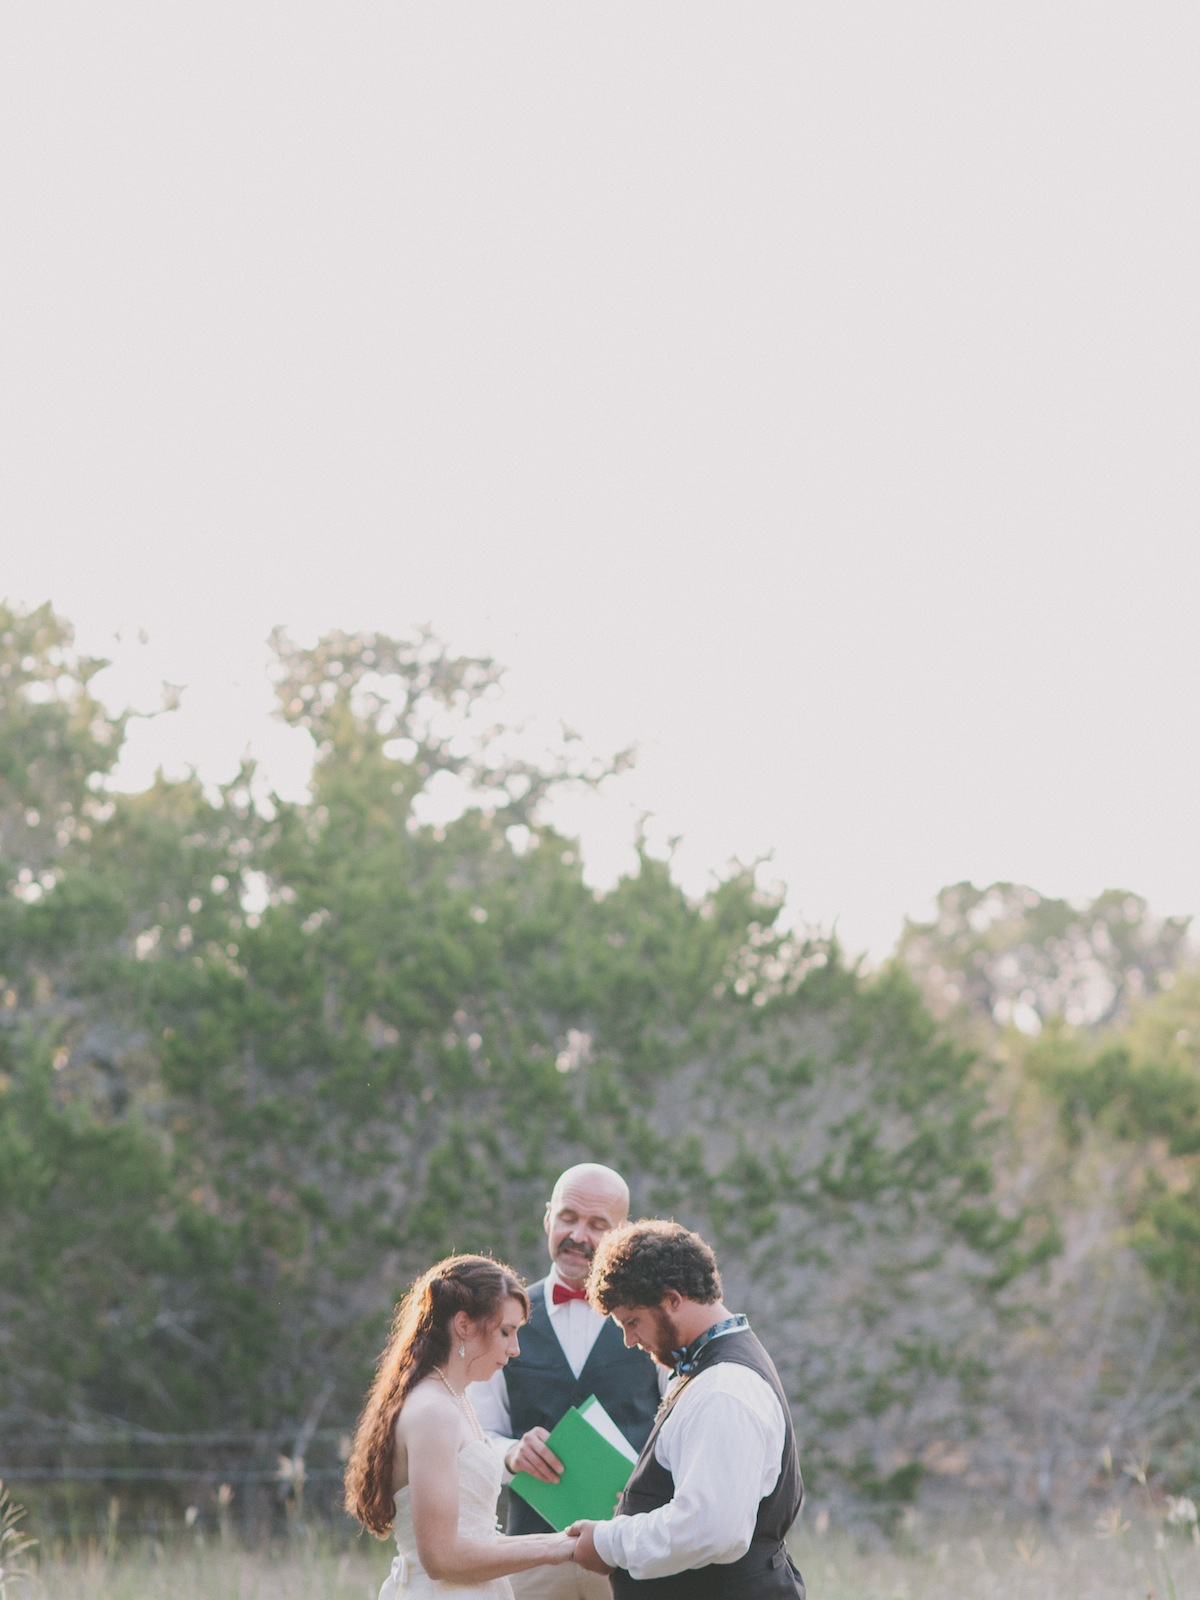 Austin-Wedding-Photographers-Photography-Wildfower-Barn-2.jpg